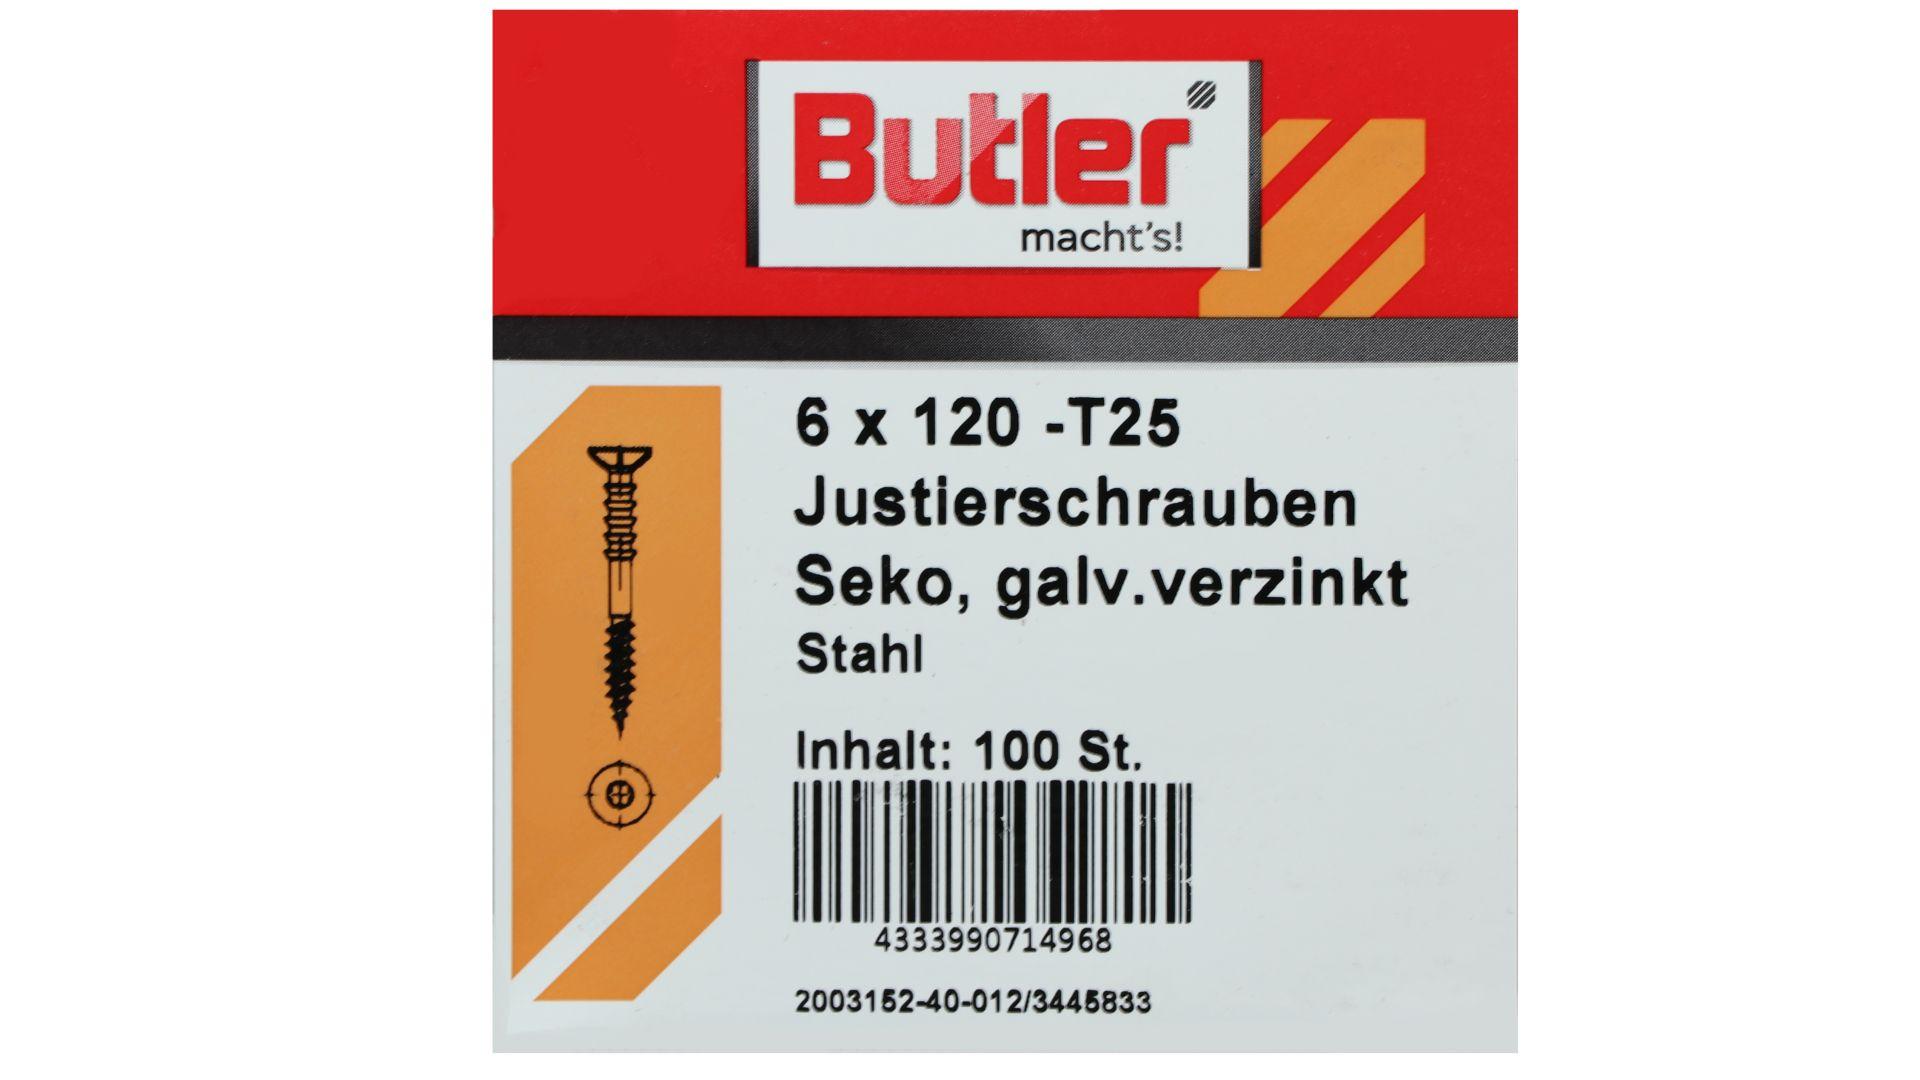 Butler macht's! Justierschraube, Stahl, Senkkopf, galvanisch verzinkt, T25, 6 x 120 mm, 100 Stück